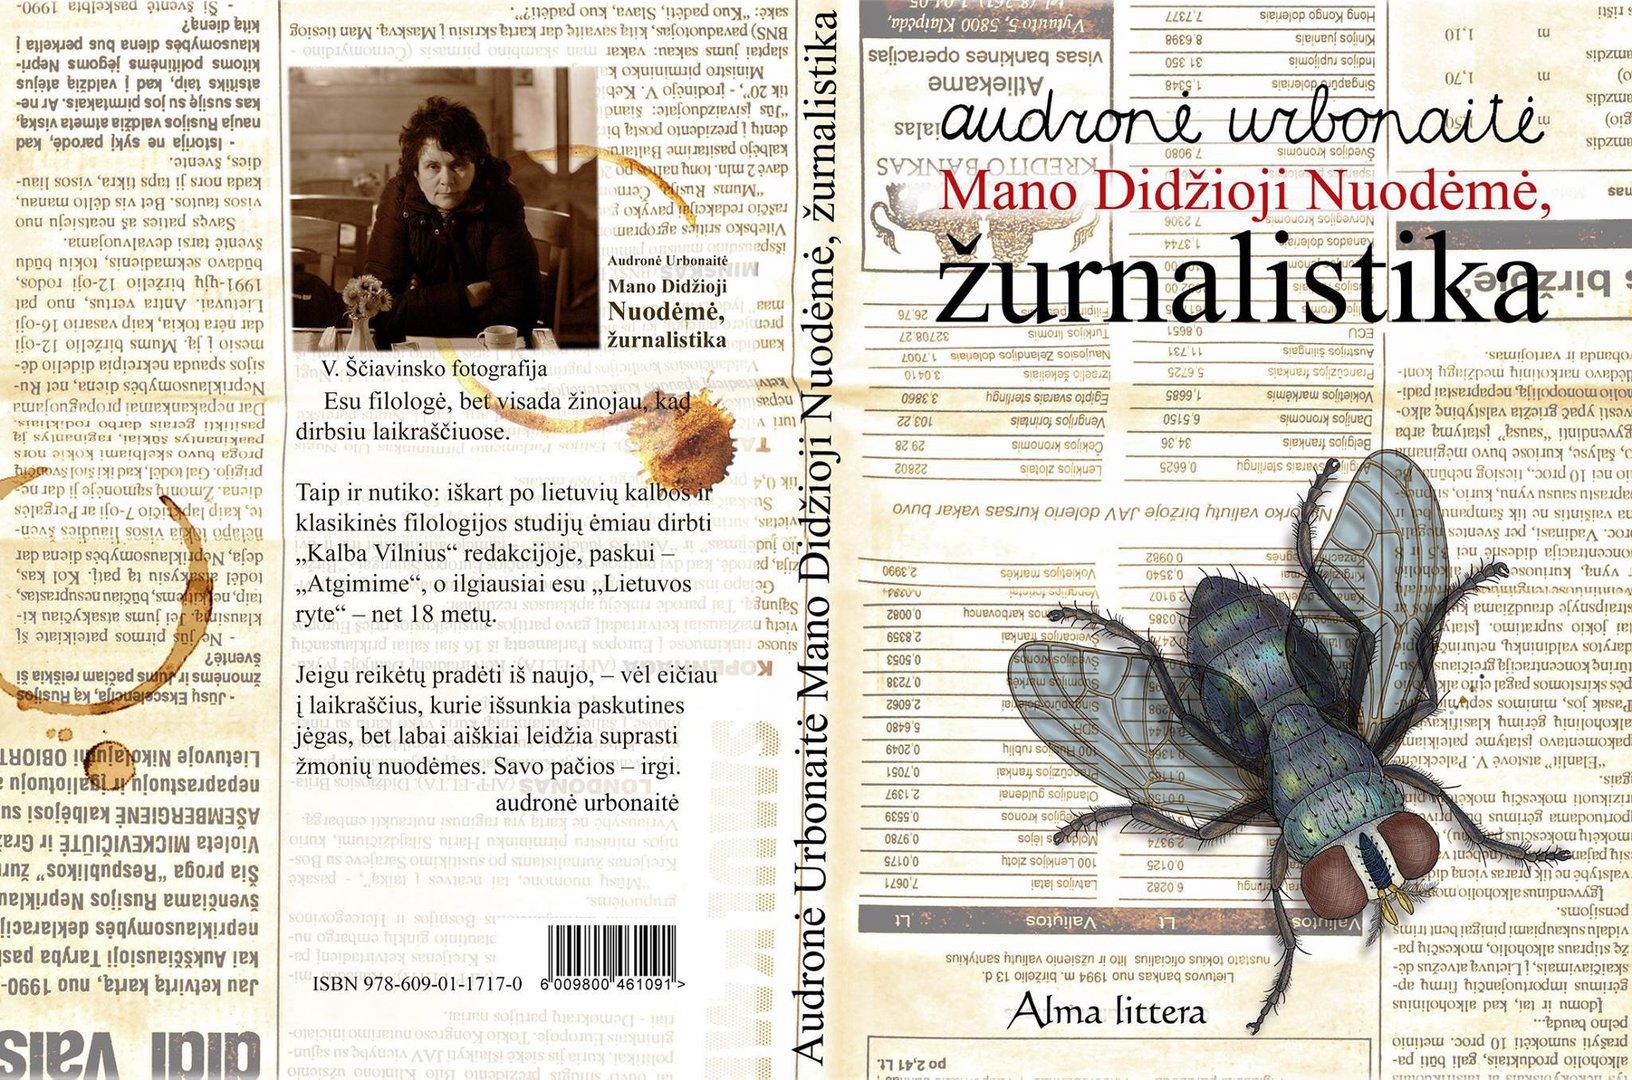 audrones-urbonaites-knygos-mano-didzioji-nuodeme-zurnalistika-virselis-54ca4c2d6e62e